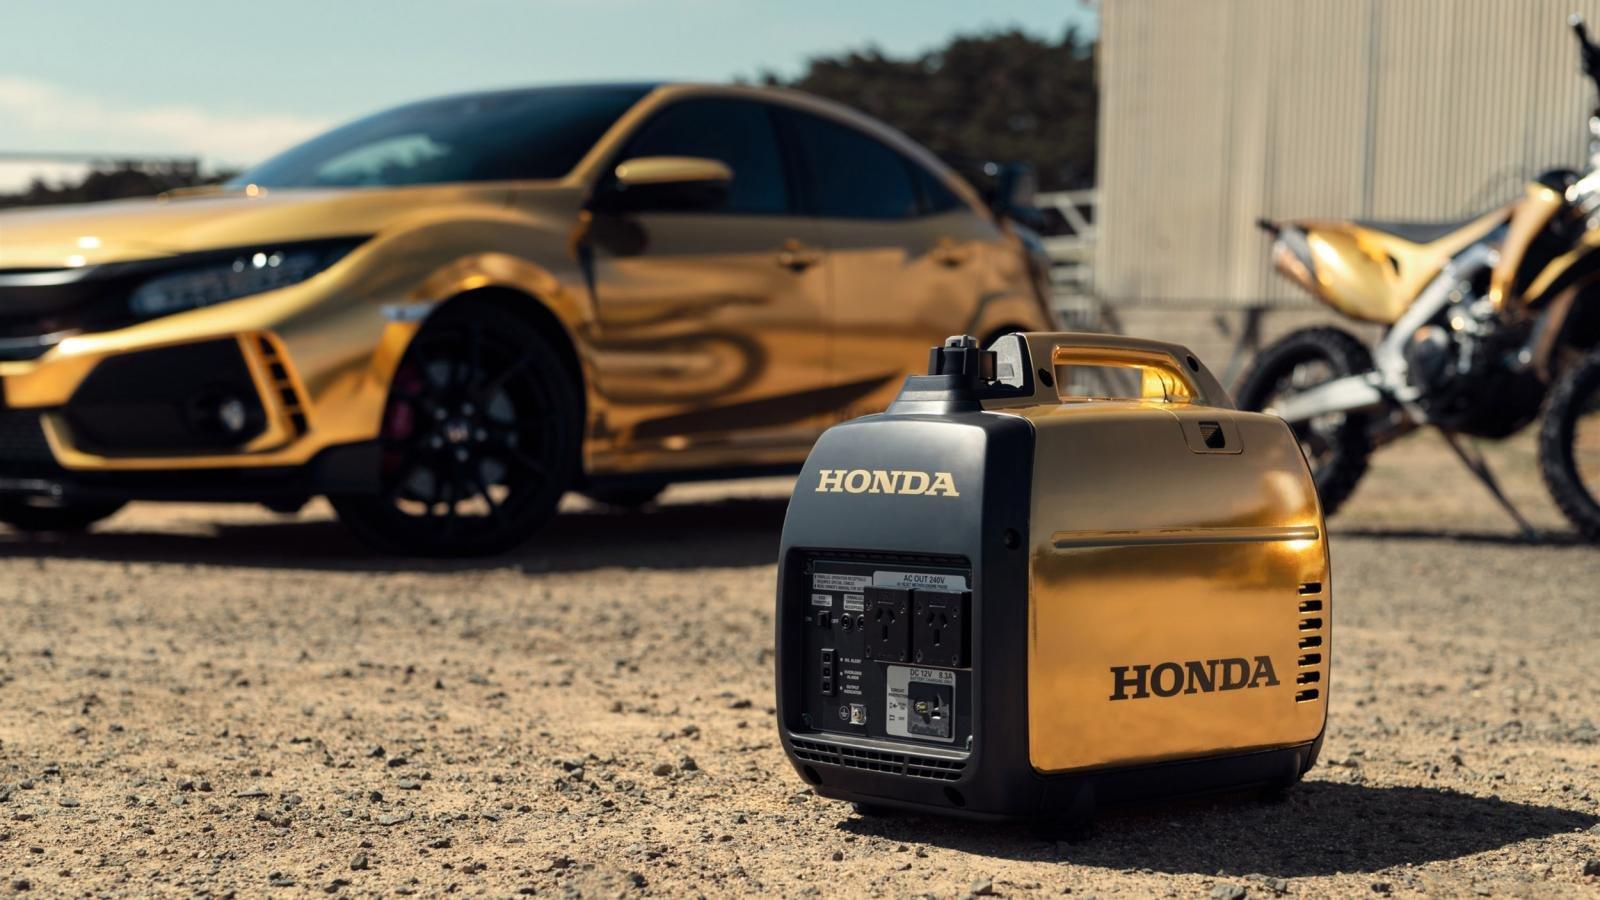 Хонда покрыла золотом мотоциклы, спорткары игазонокосилку